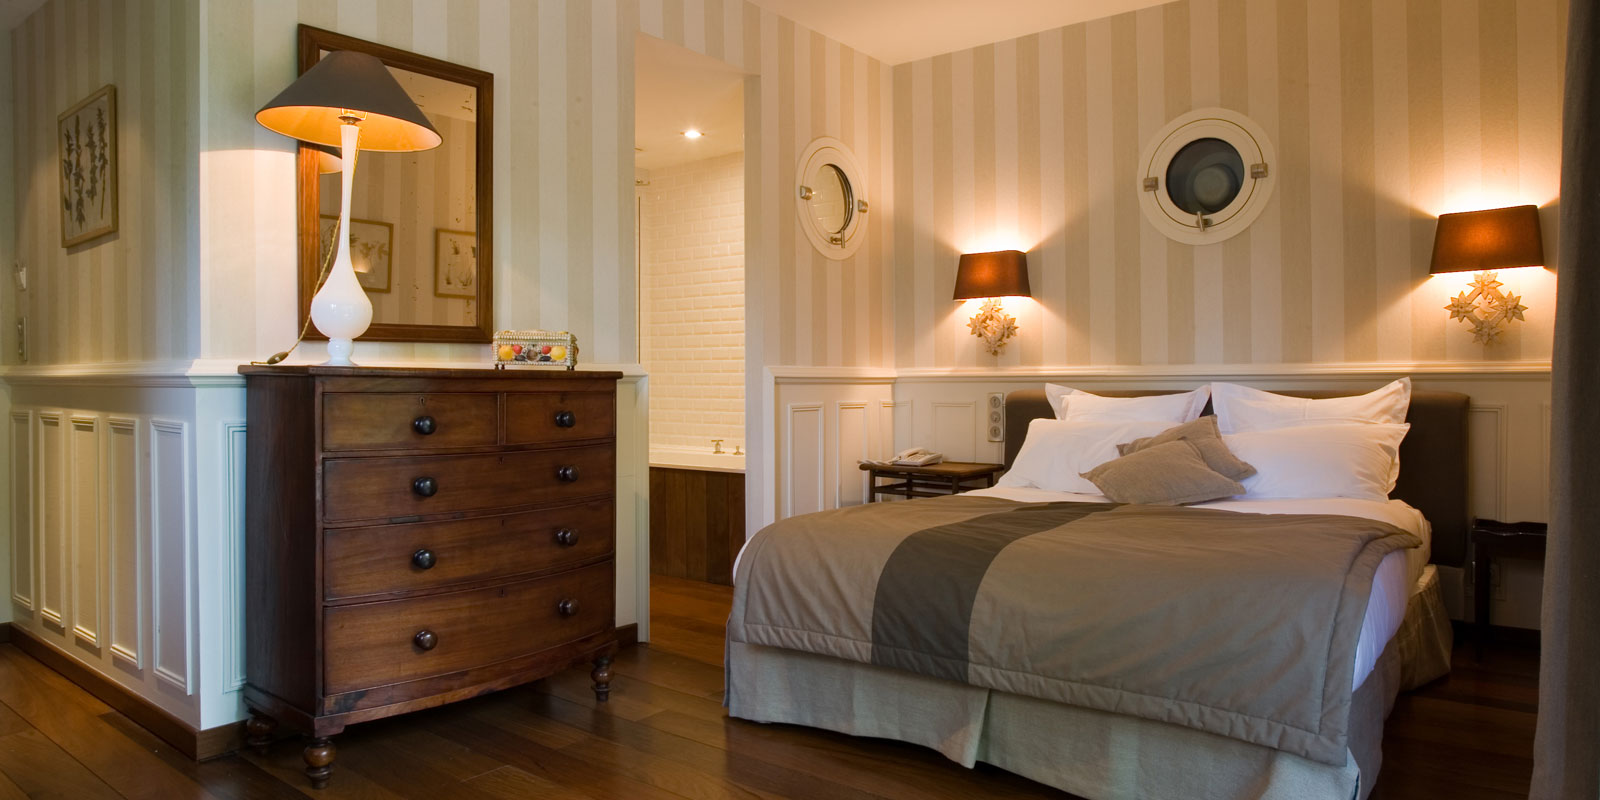 h tels l ge cap ferret. Black Bedroom Furniture Sets. Home Design Ideas